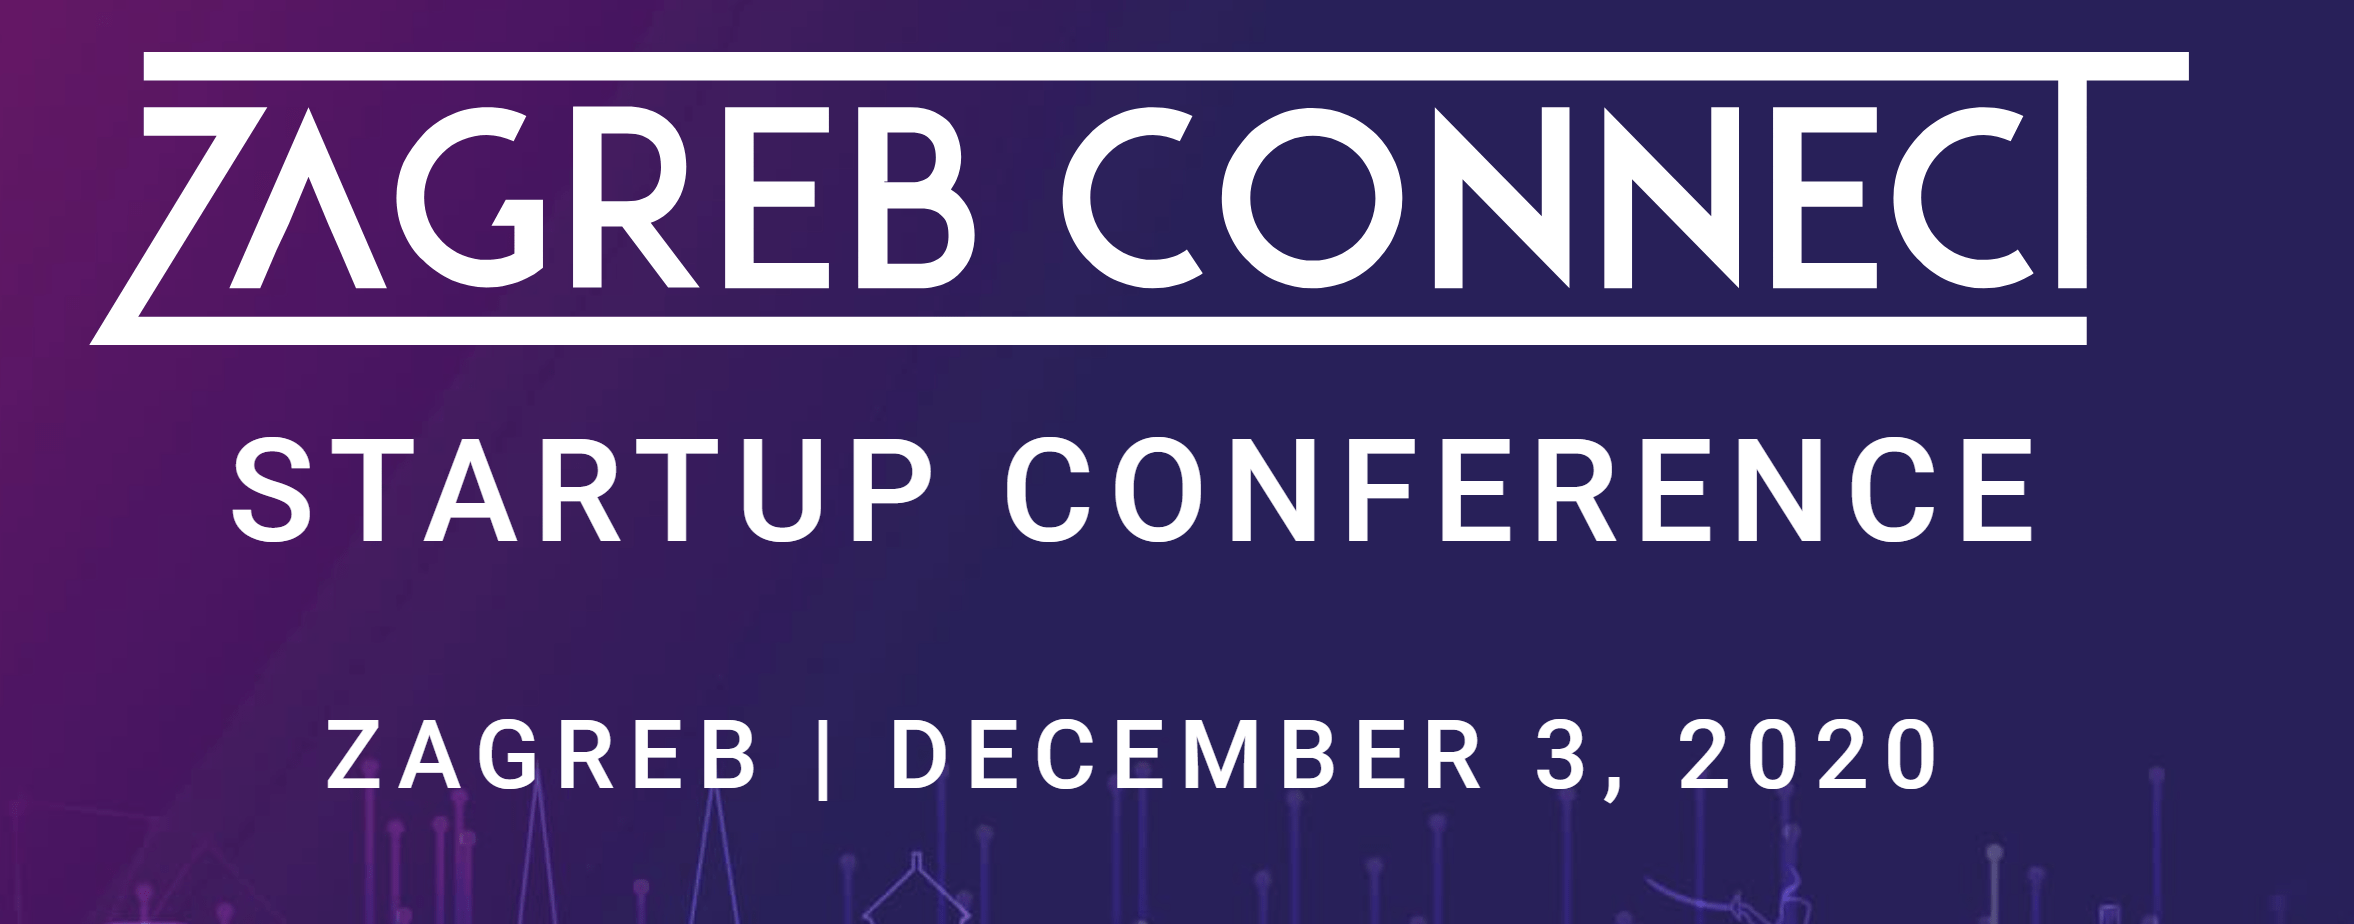 Pozivamo vas na Zagreb Connect 2020!